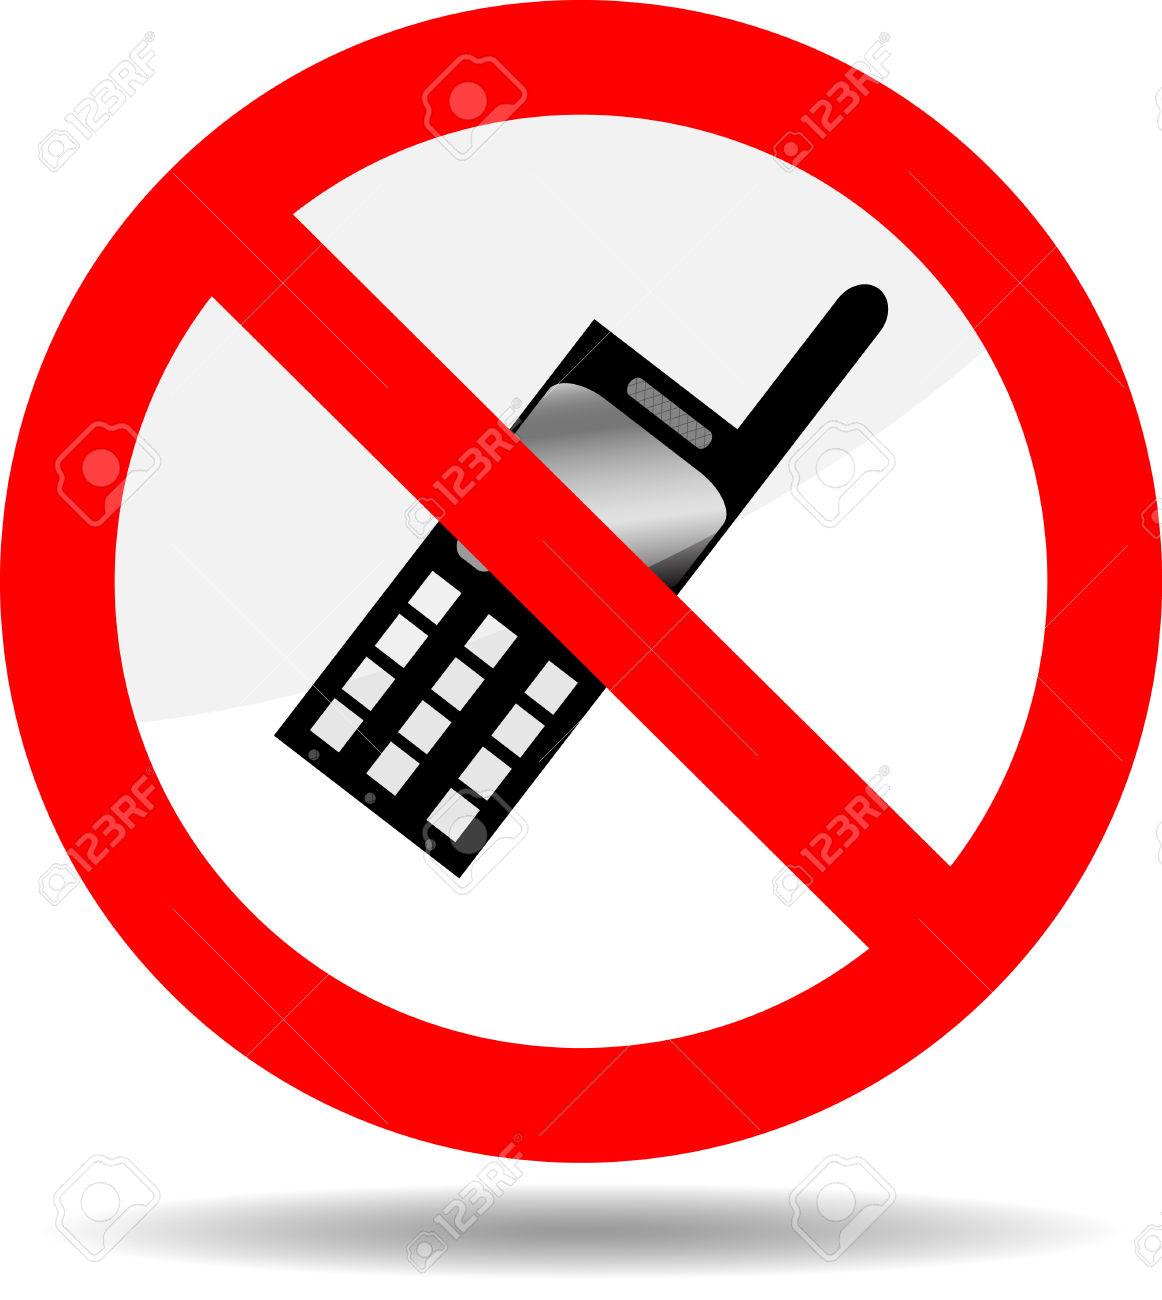 Ban Telephone. Symbol Phone, Prohibited Call Icon, Forbid And.